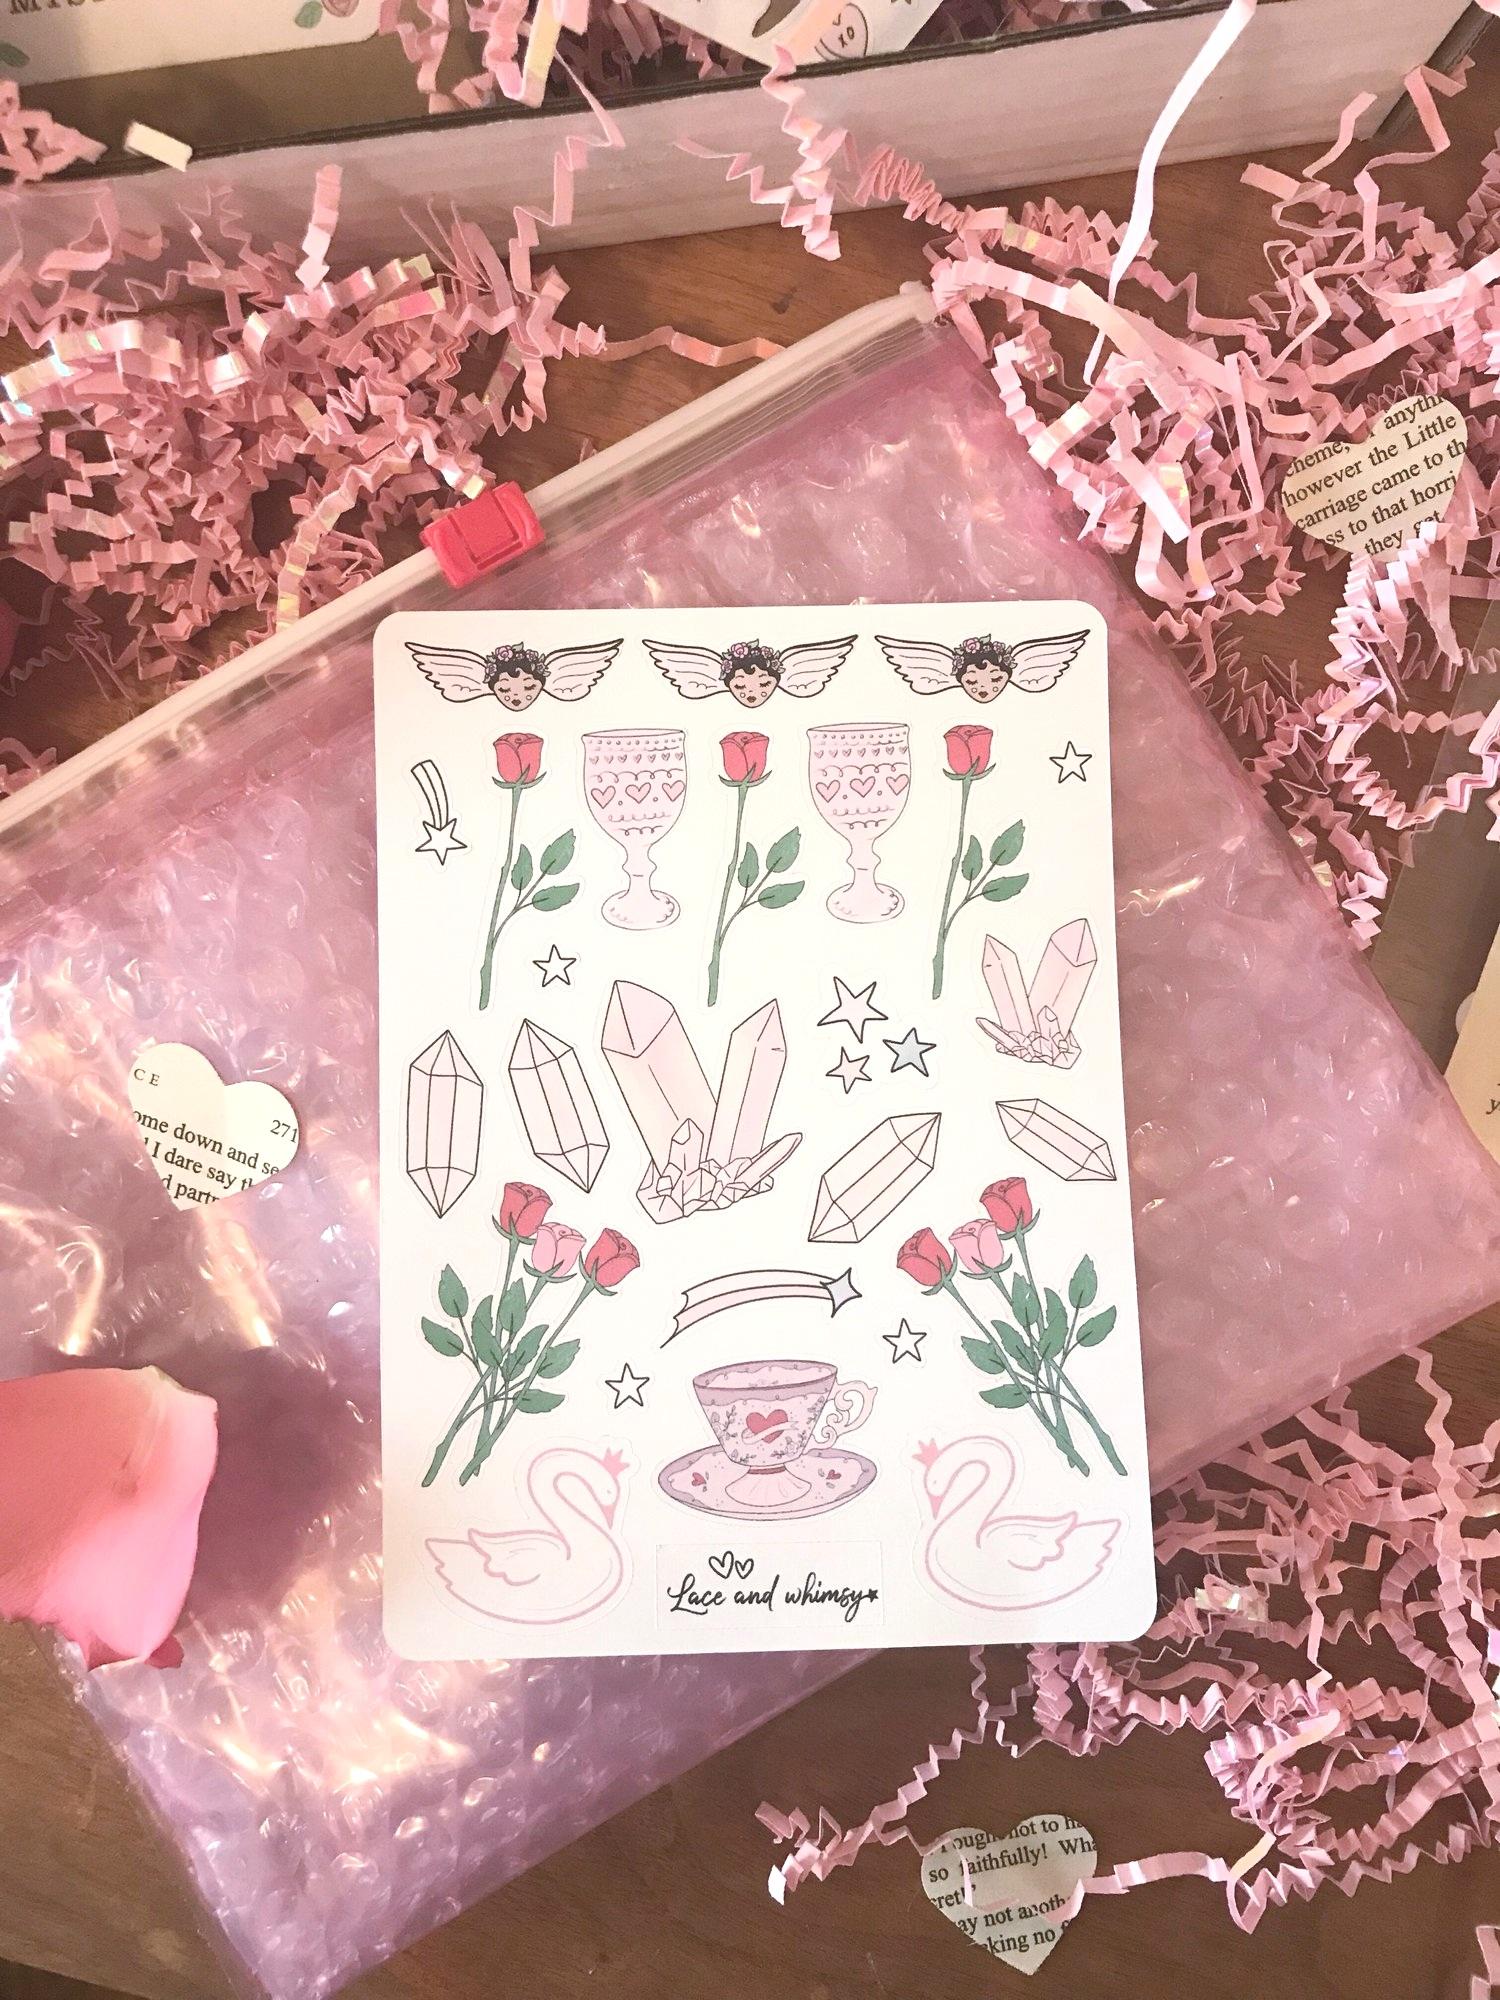 Love Spell 03 Sticker Sheet